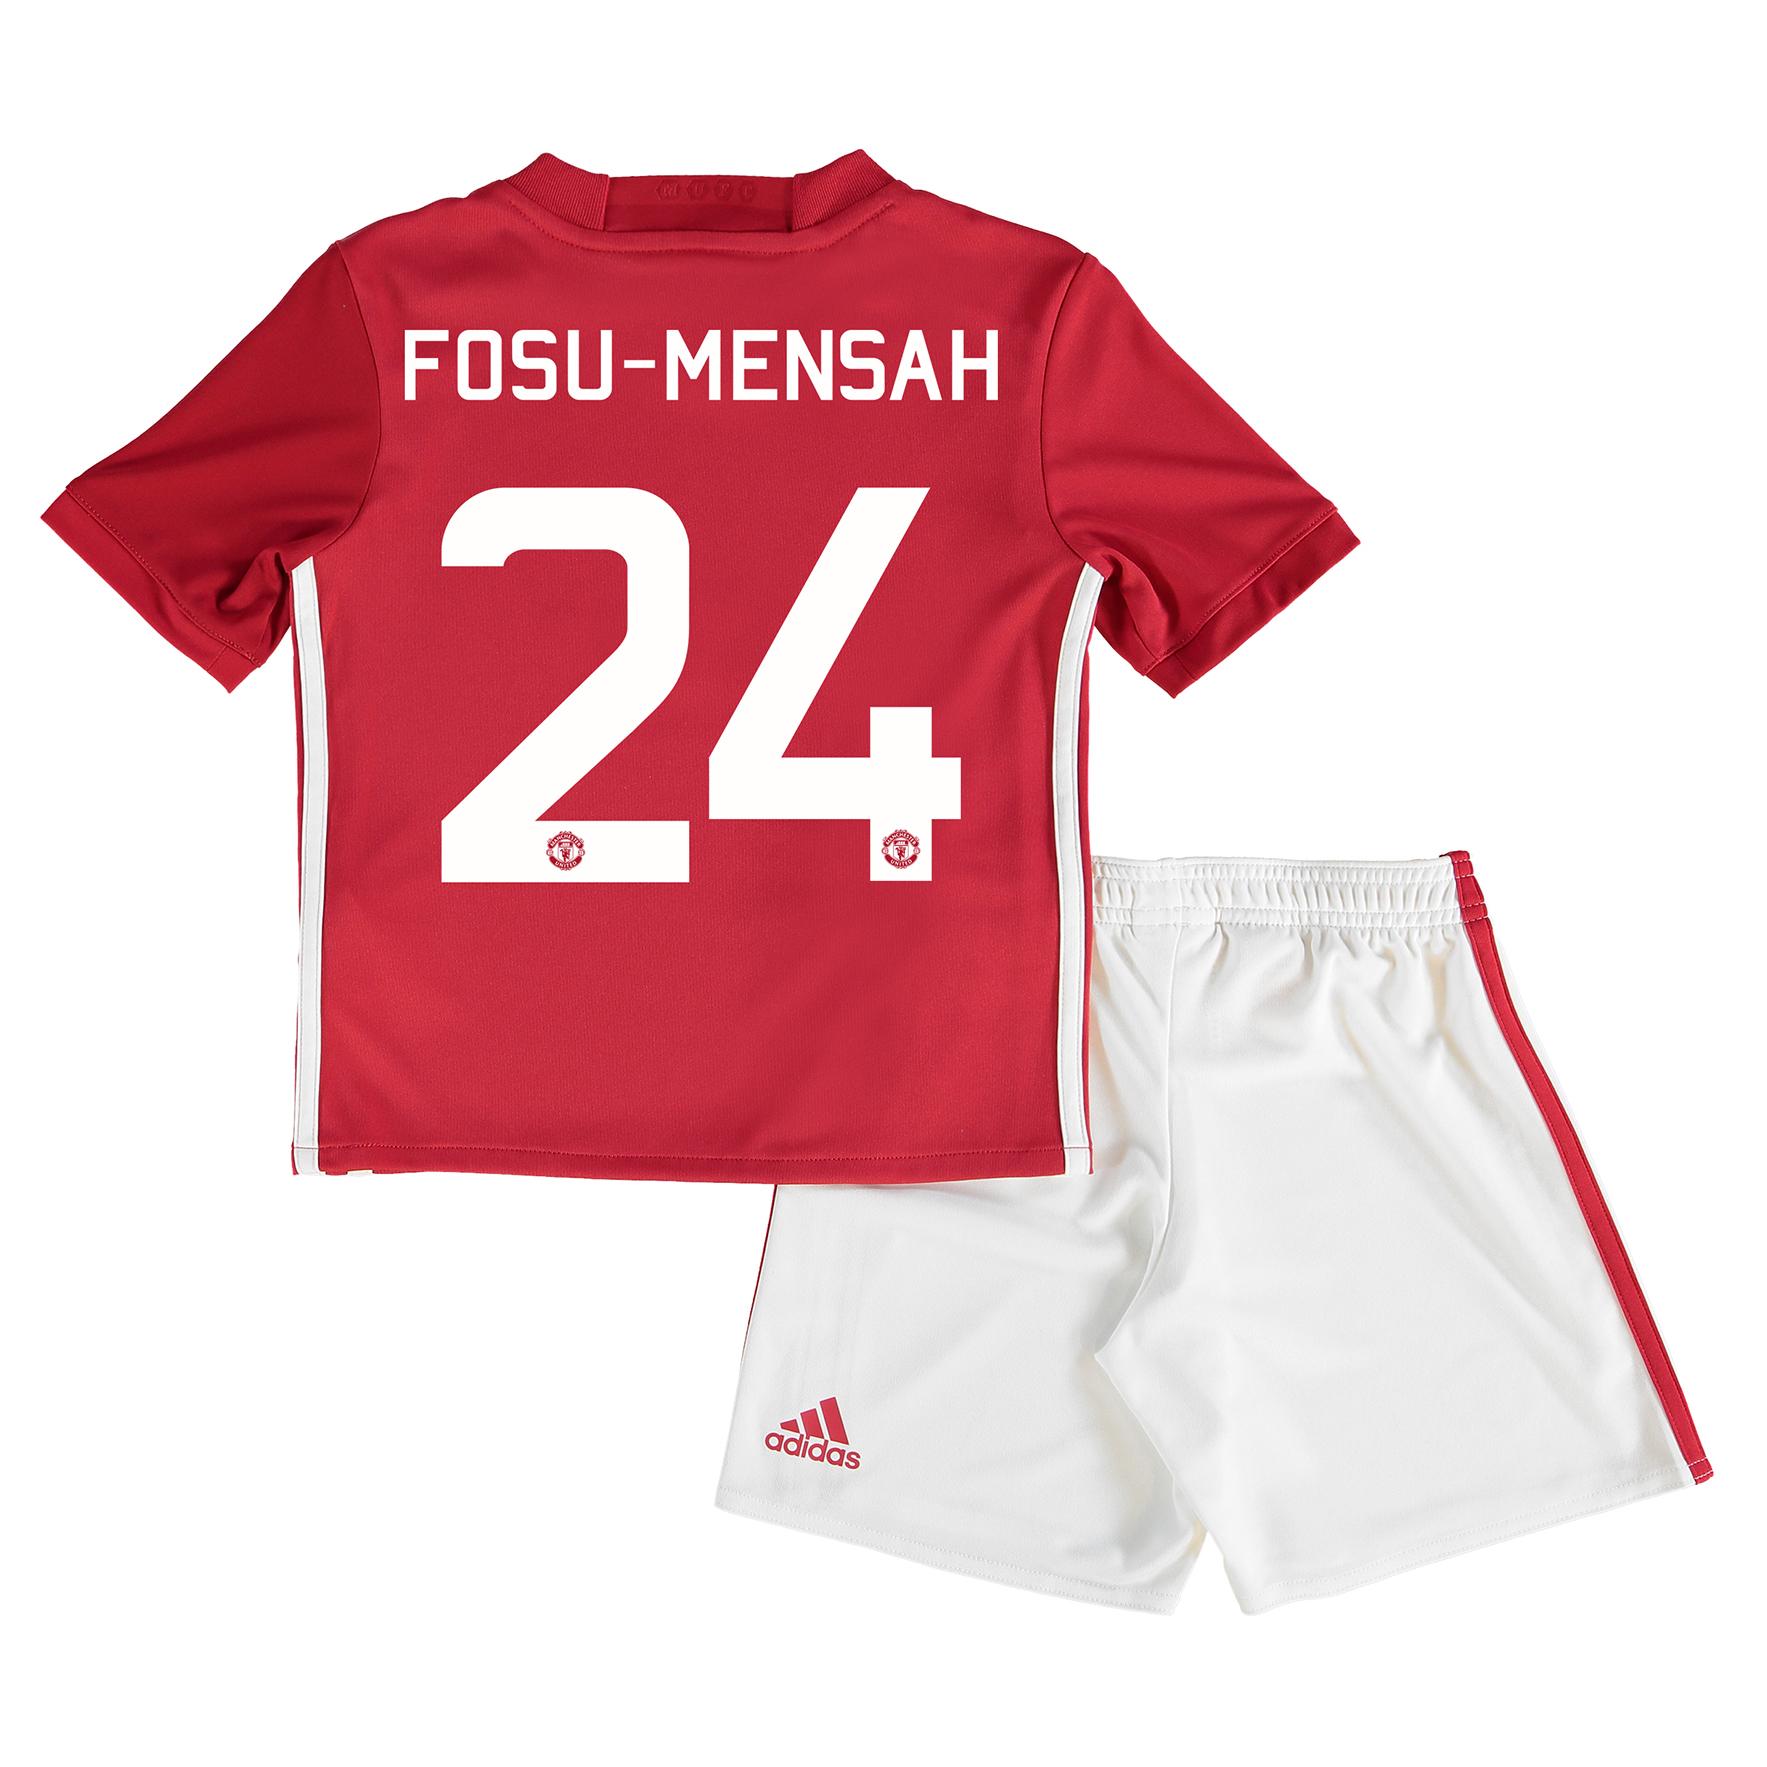 Manchester United Cup Home Mini Kit 2016-17 with Fosu-Mensah 24 printi